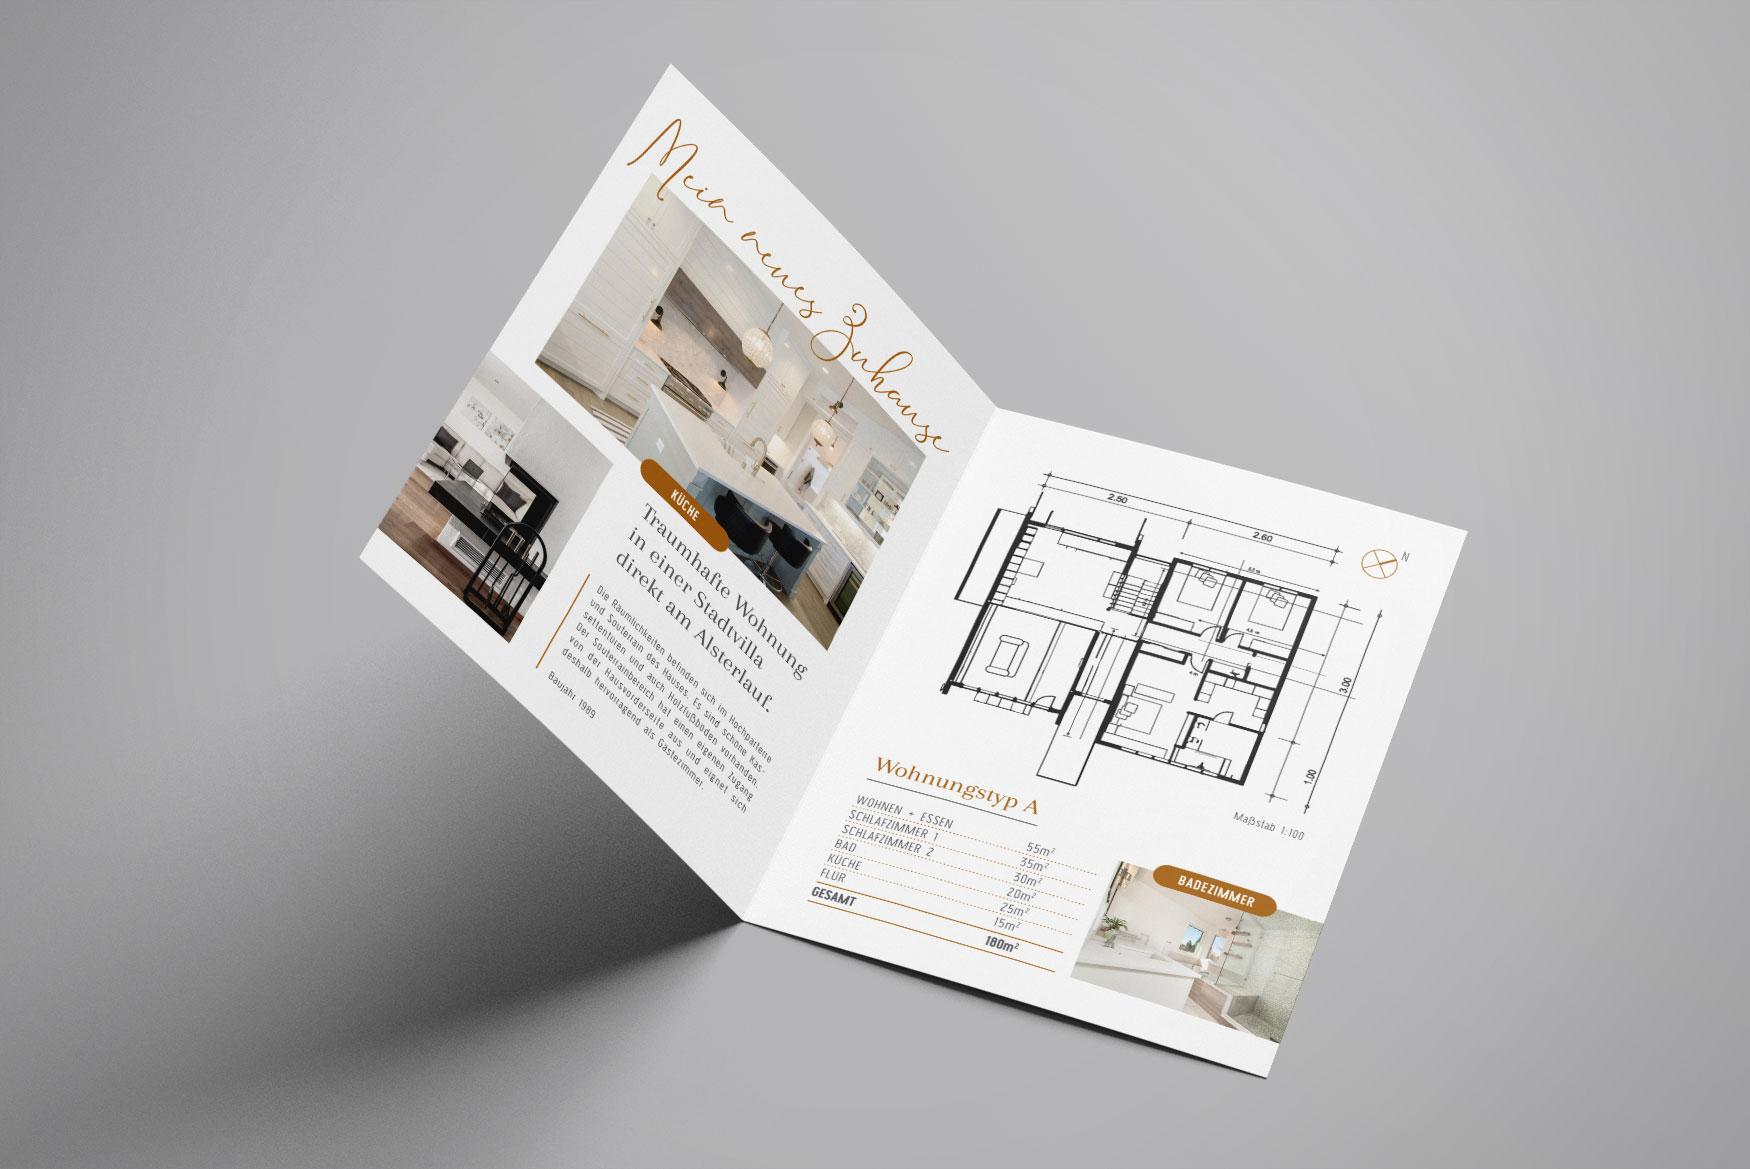 Exposee-Design-Immobilien-2-Designagentur-Stuttgart-Kreativbetrieb